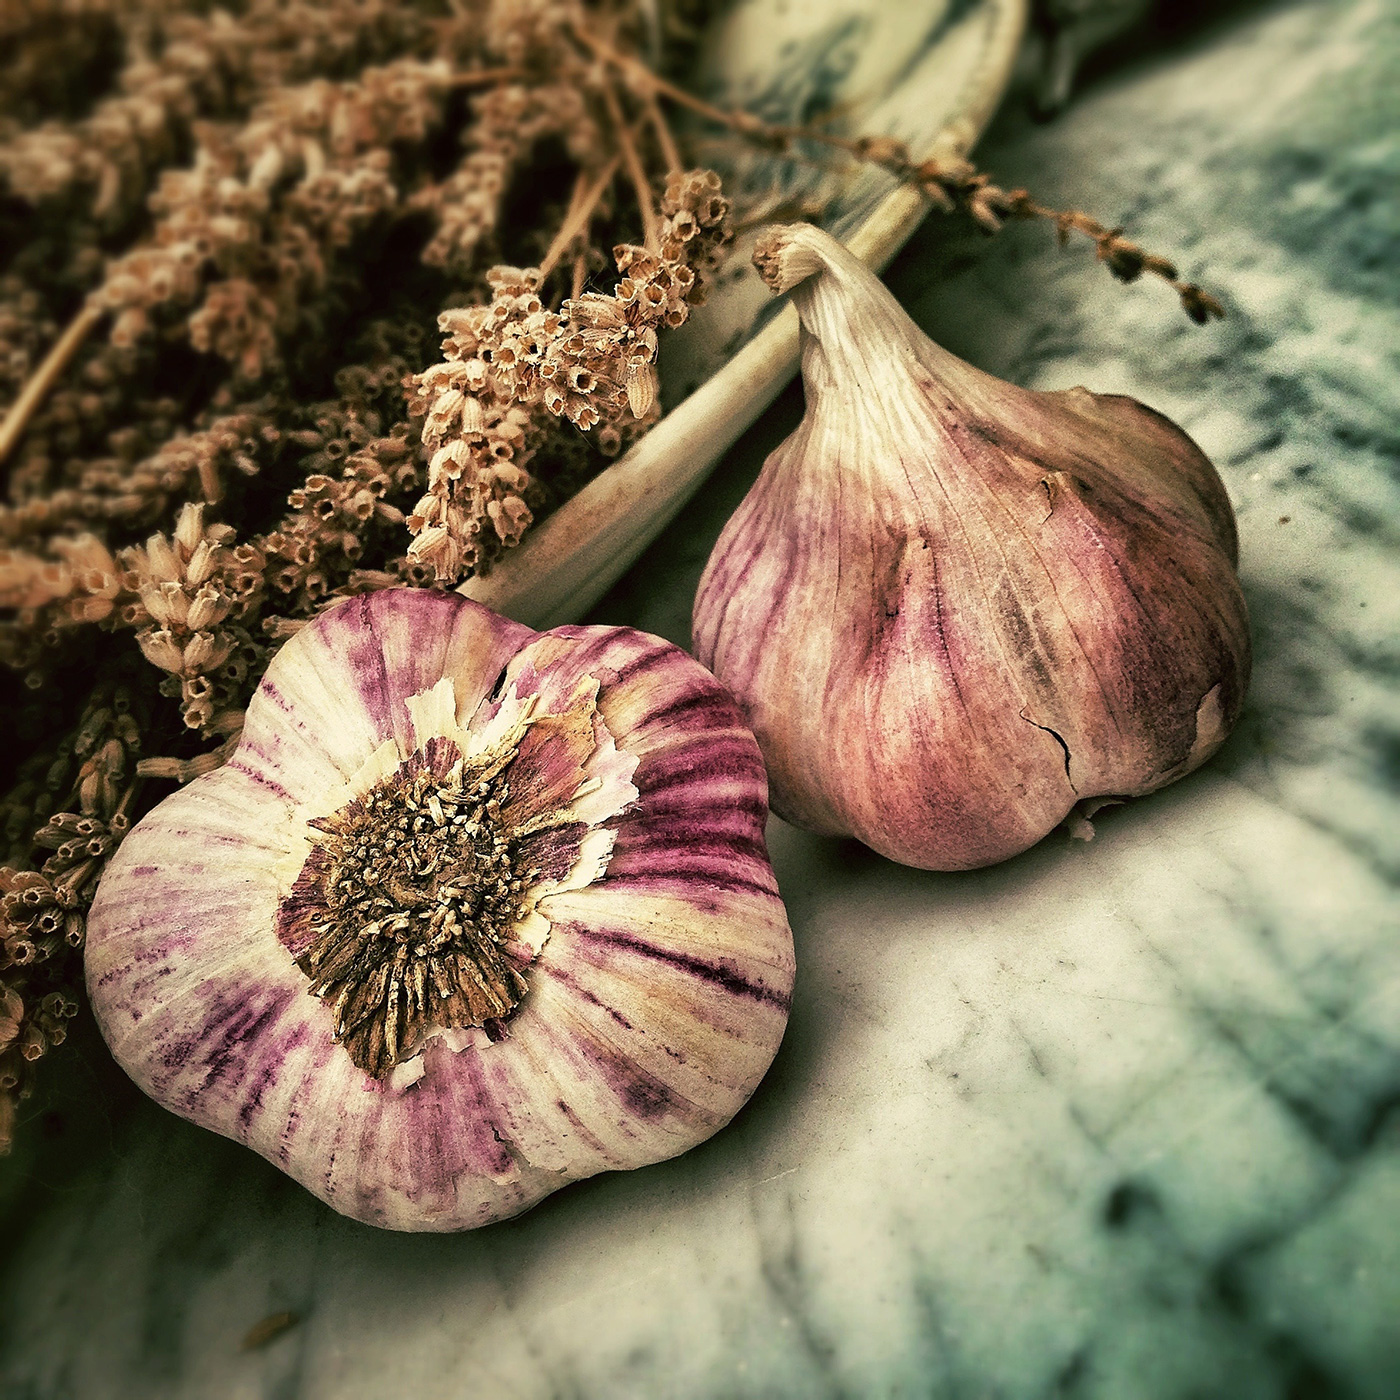 Garlic is my favorite ingredient